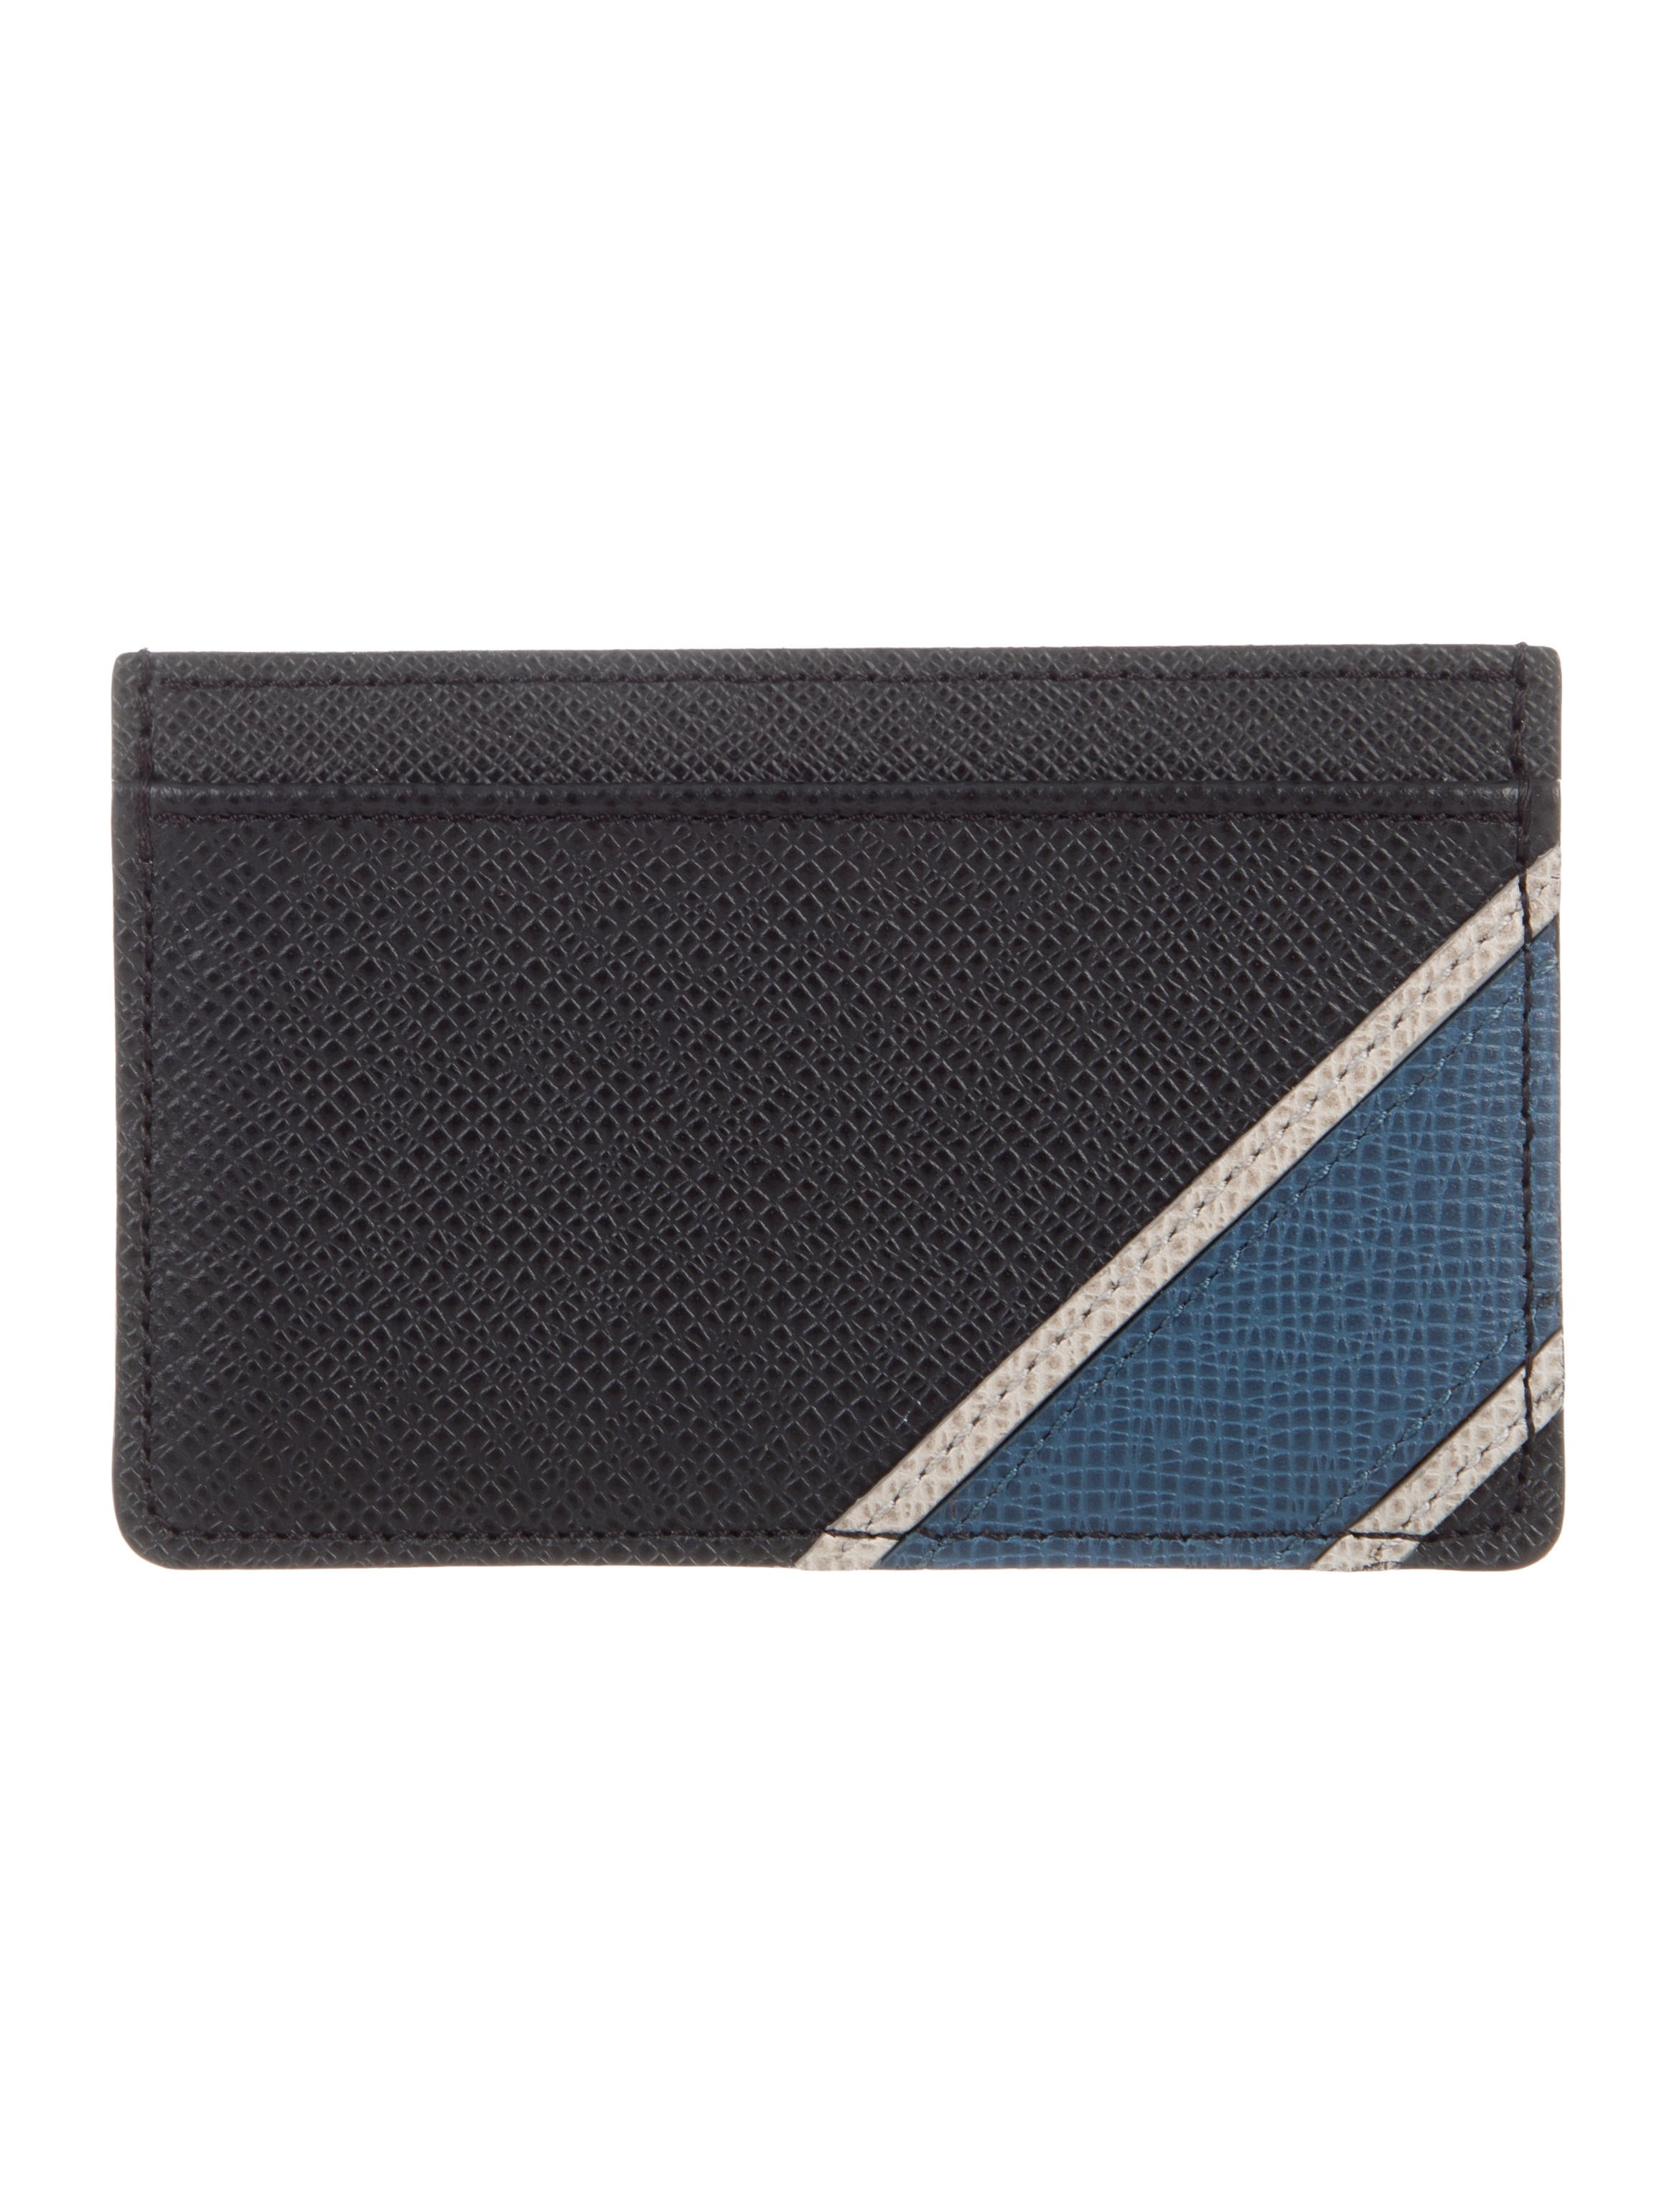 7c54298b19d1 Louis Vuitton Taiga Cardholder - Accessories - LOU225750